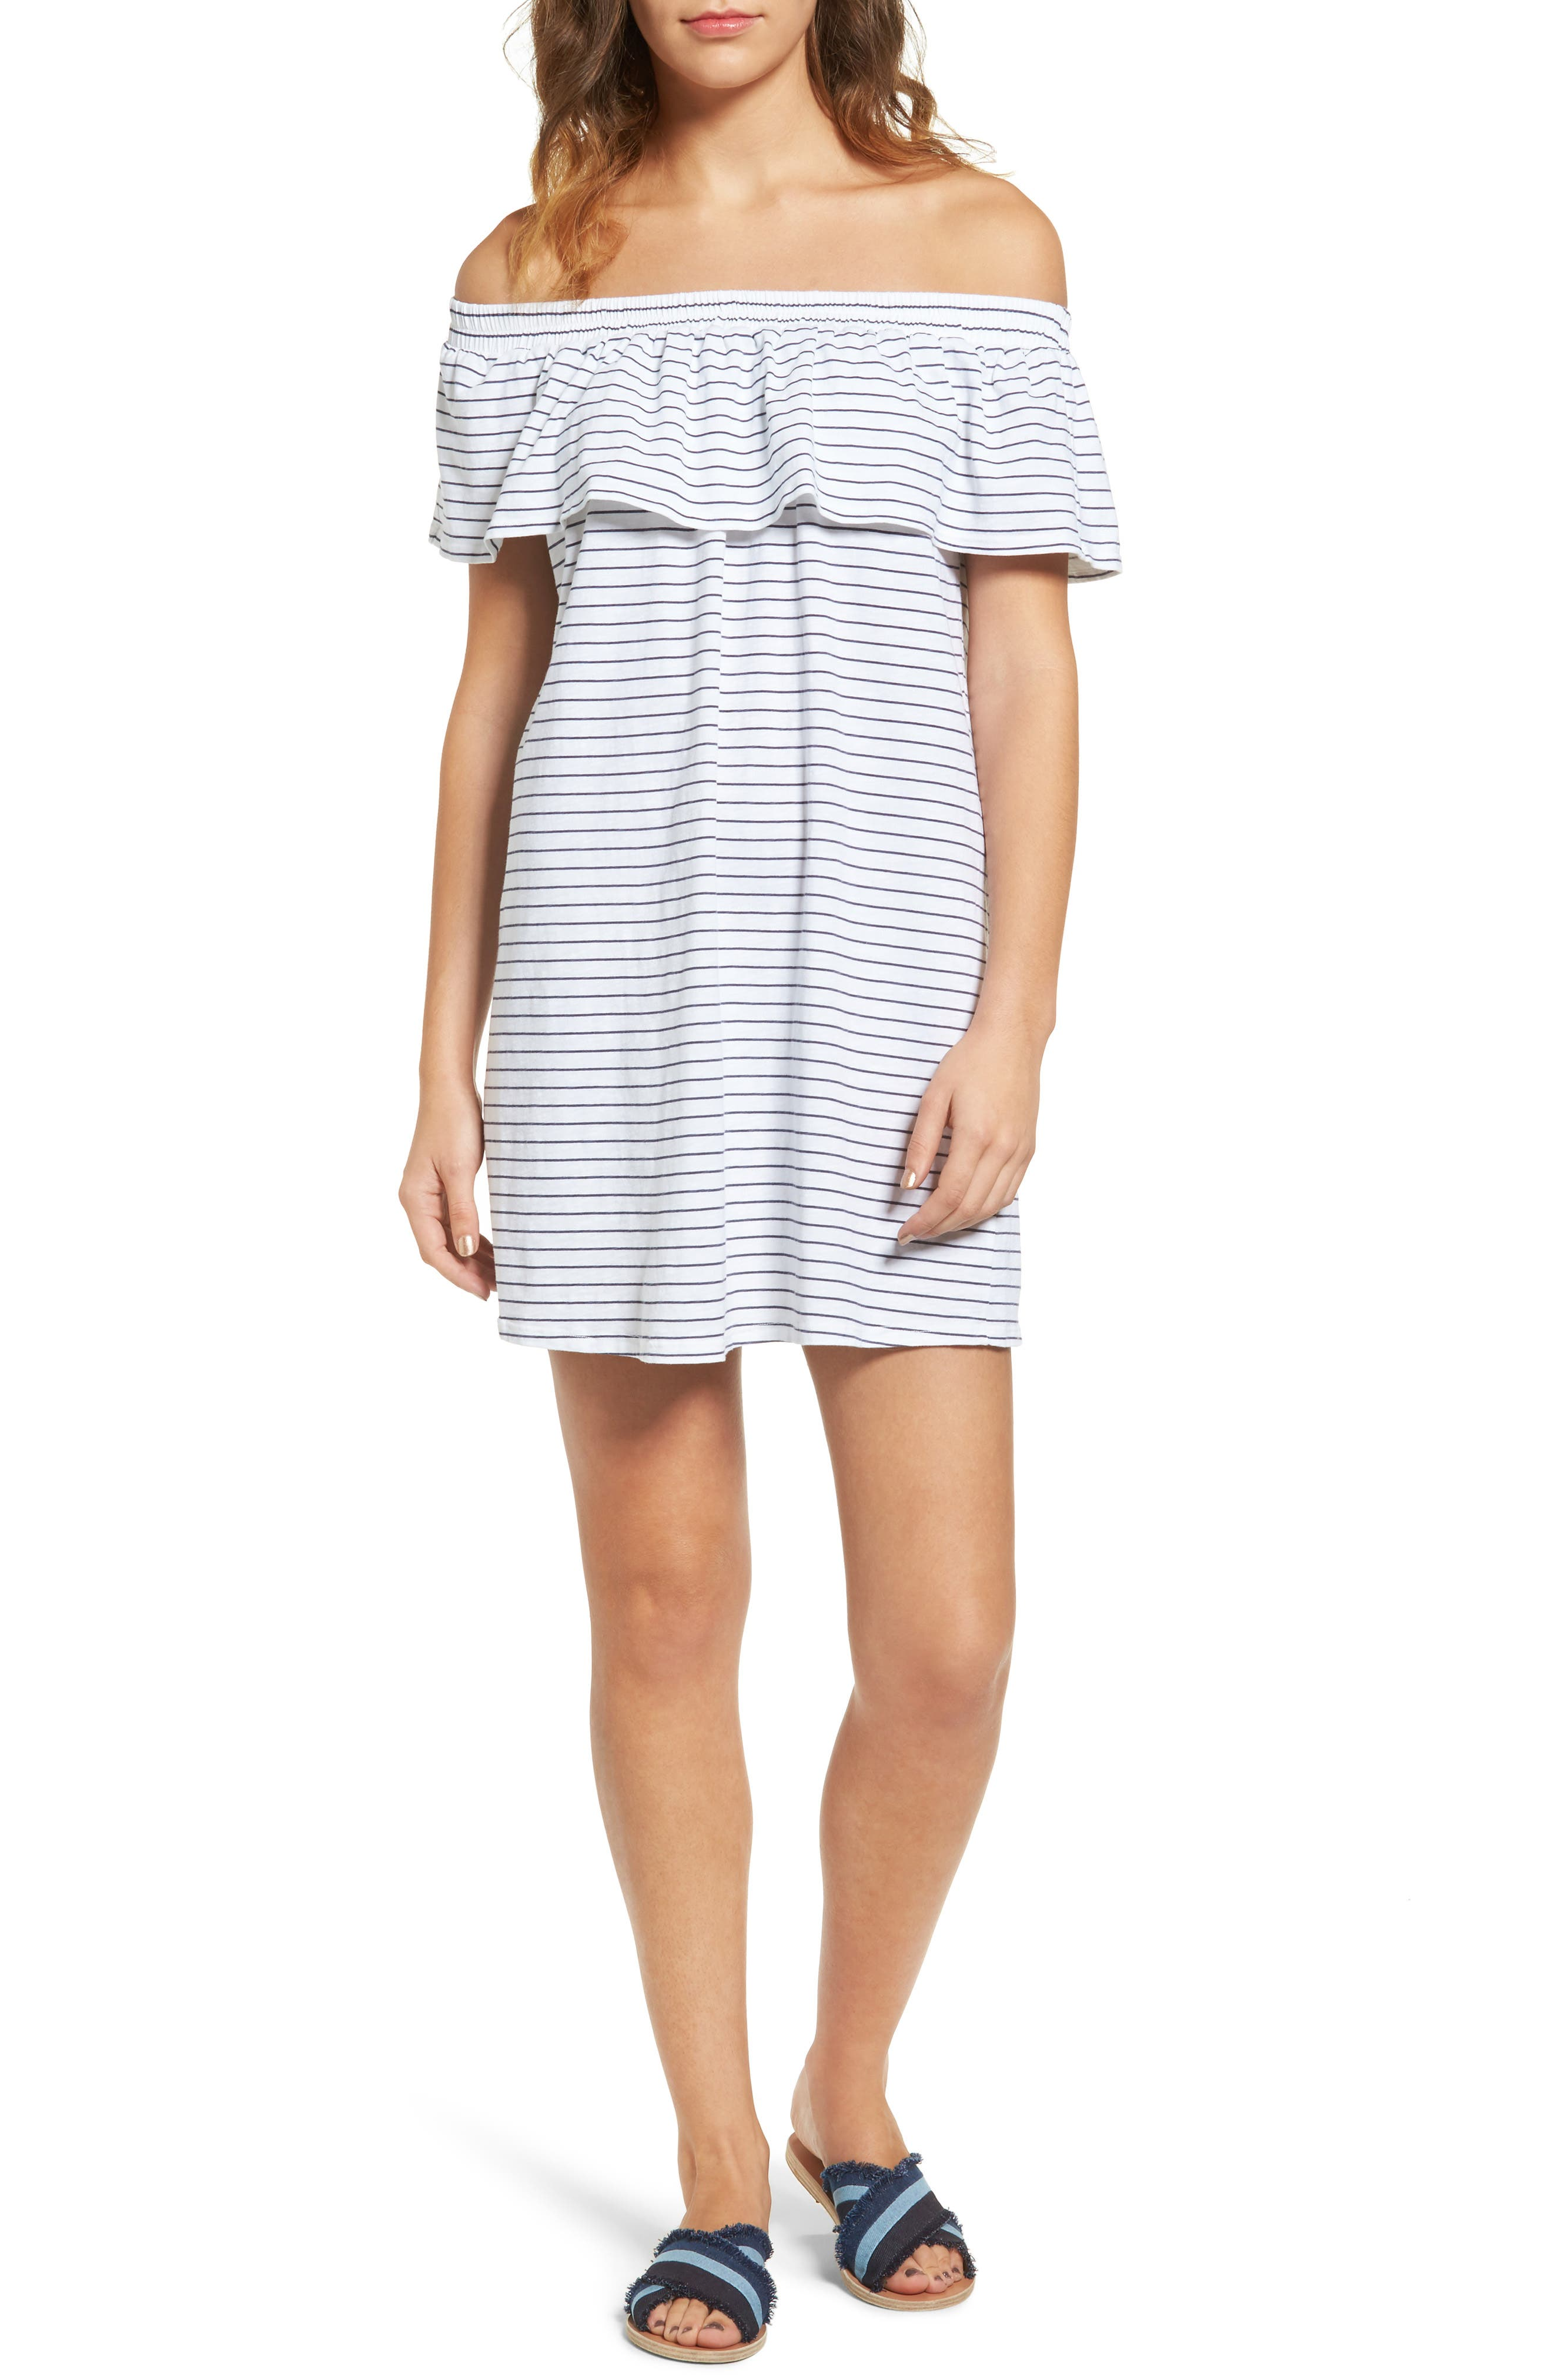 Alternate Image 1 Selected - Sundry Ruffle Off the Shoulder Dress